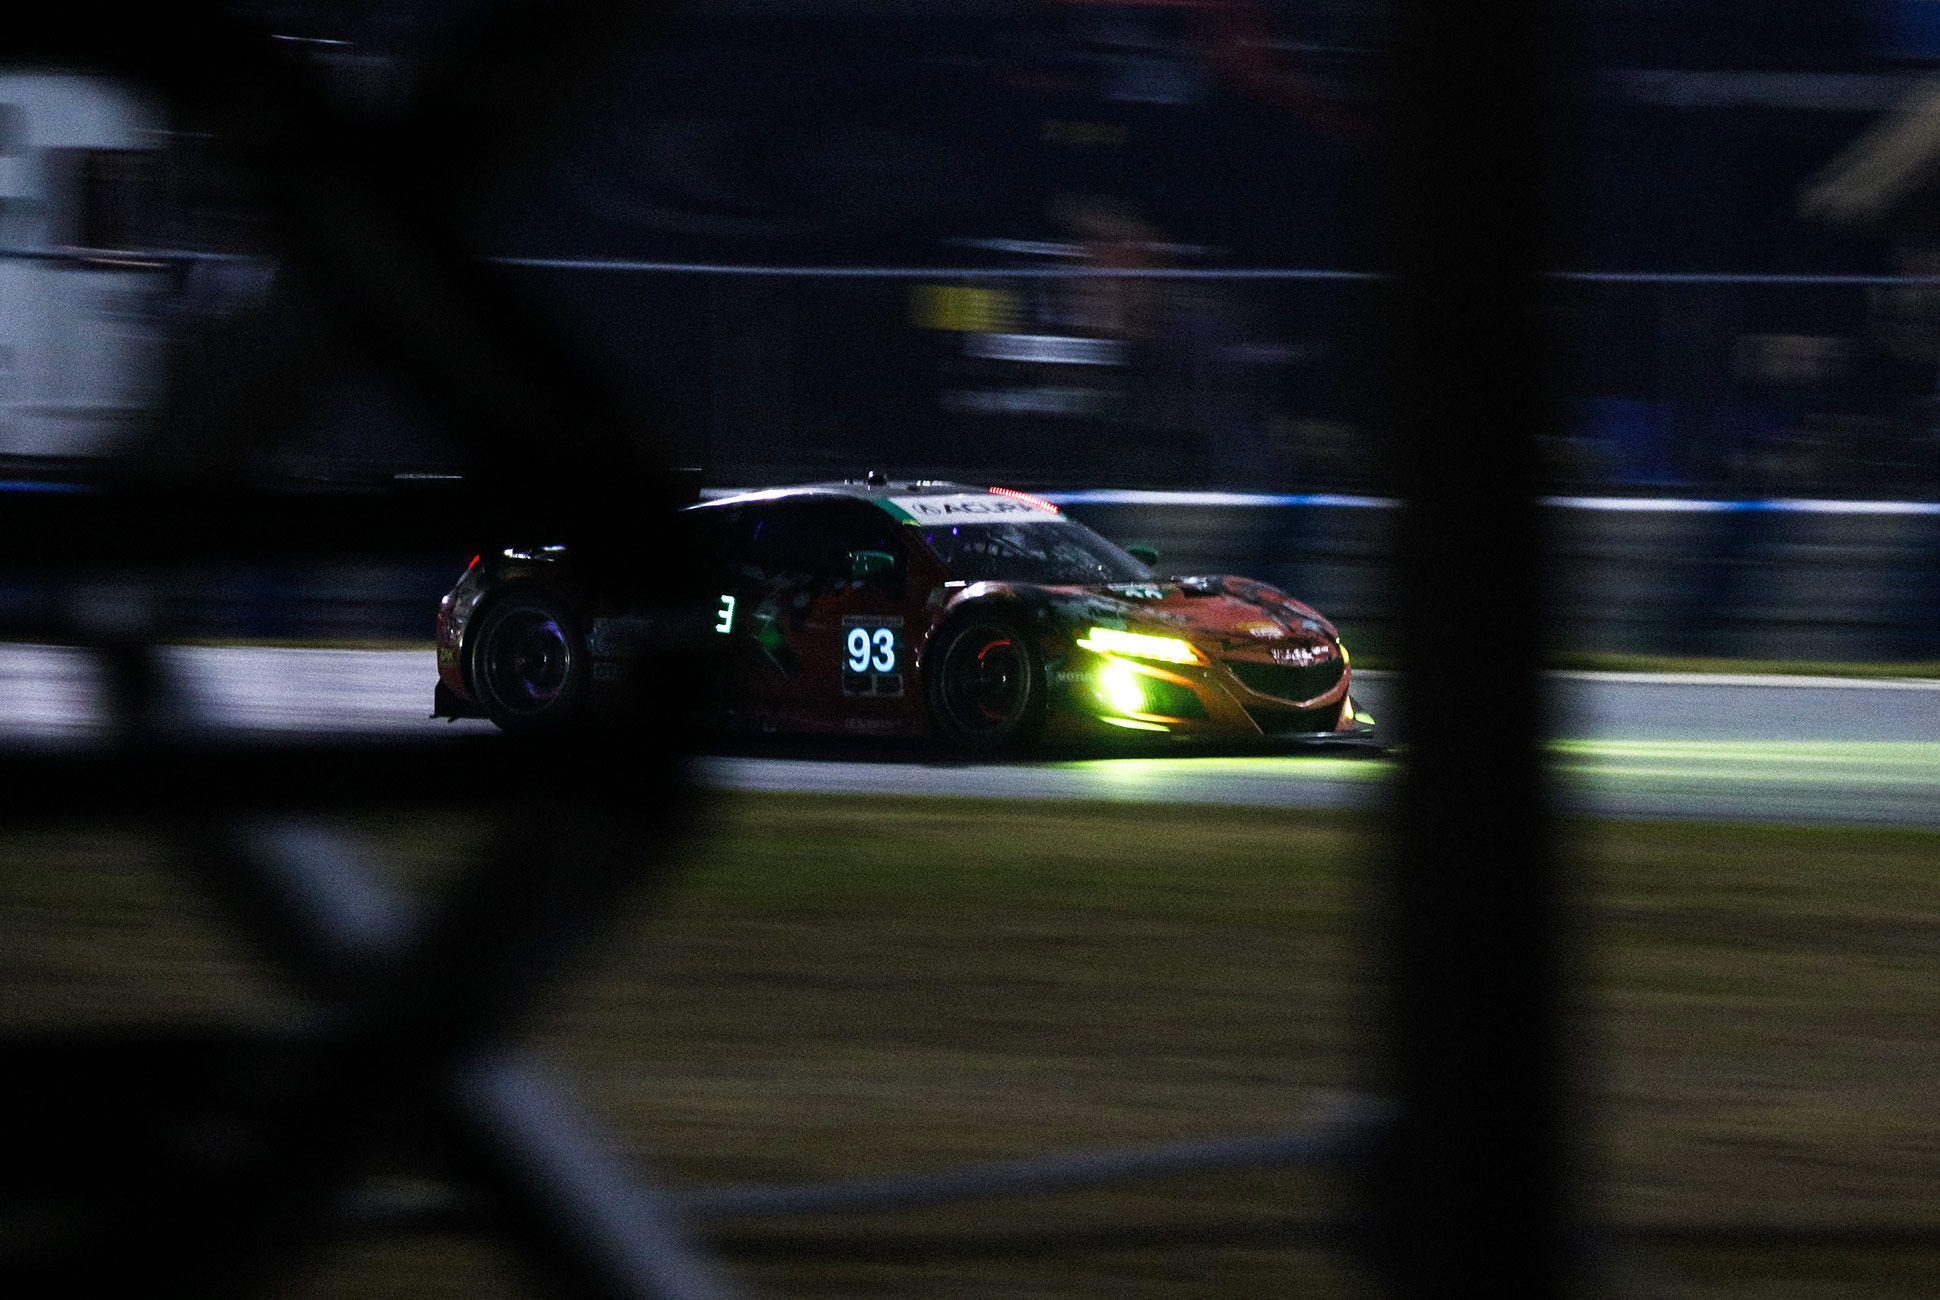 Best-Sports-Cars-of-2018-Daytona-24-Hours-gear-patrol-Acura-NSX-GT3-4